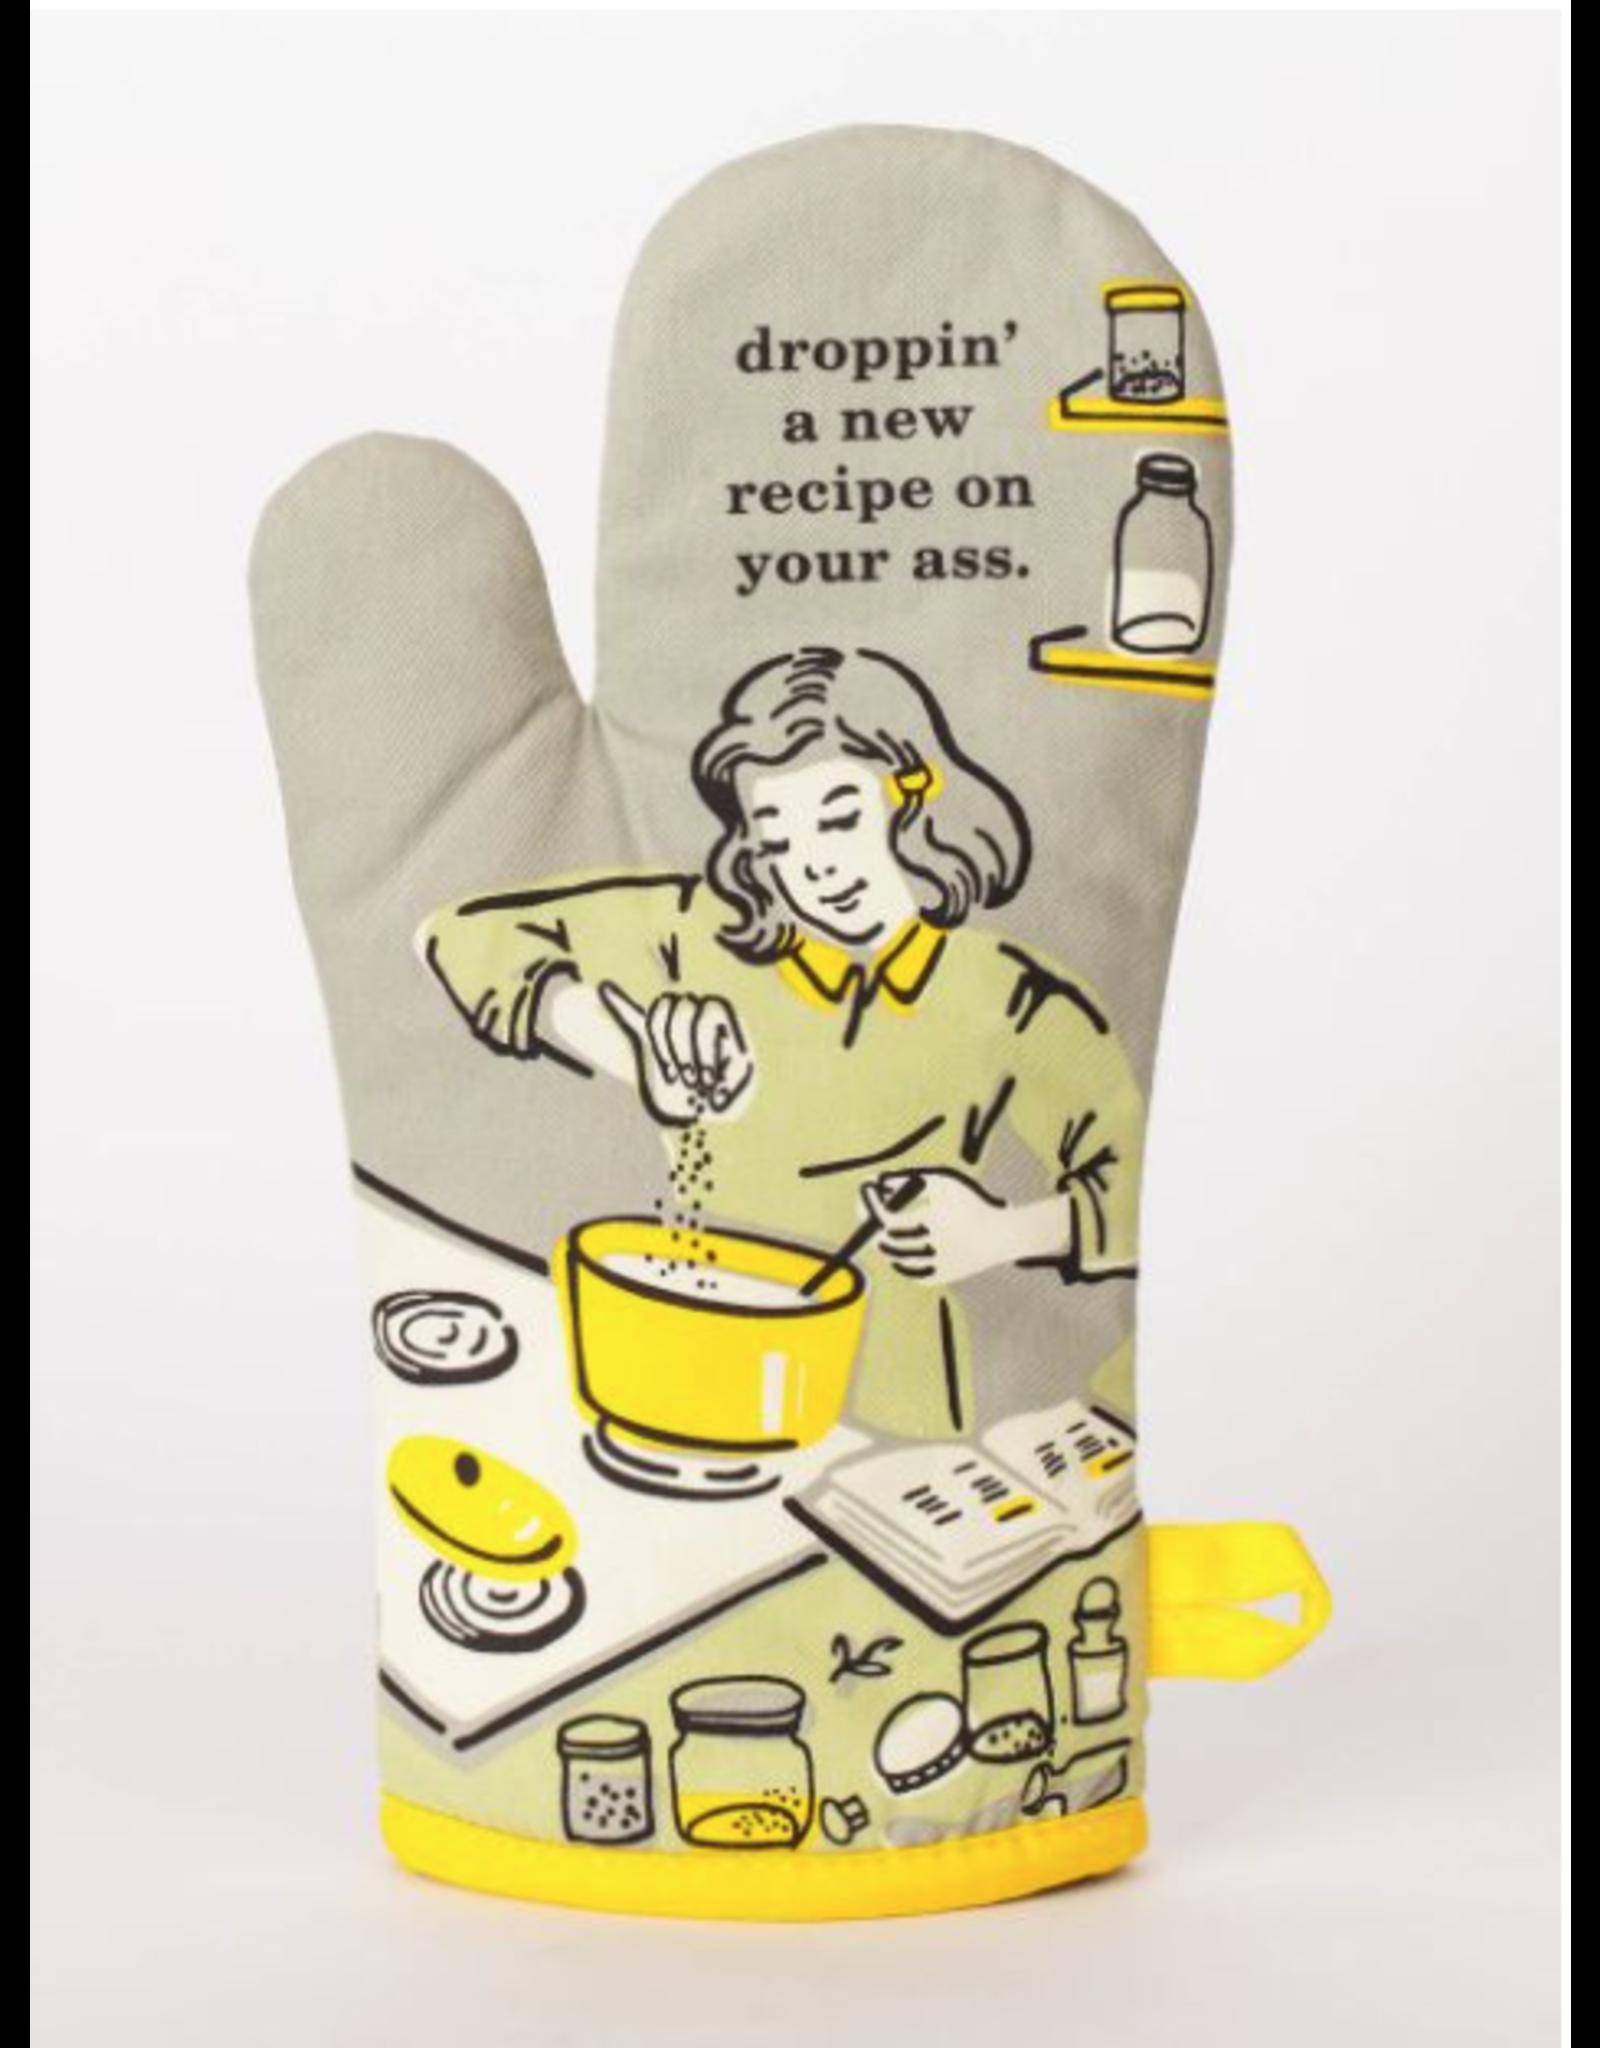 Blue Q Blue Q - Droppin' a Recipe oven mitt